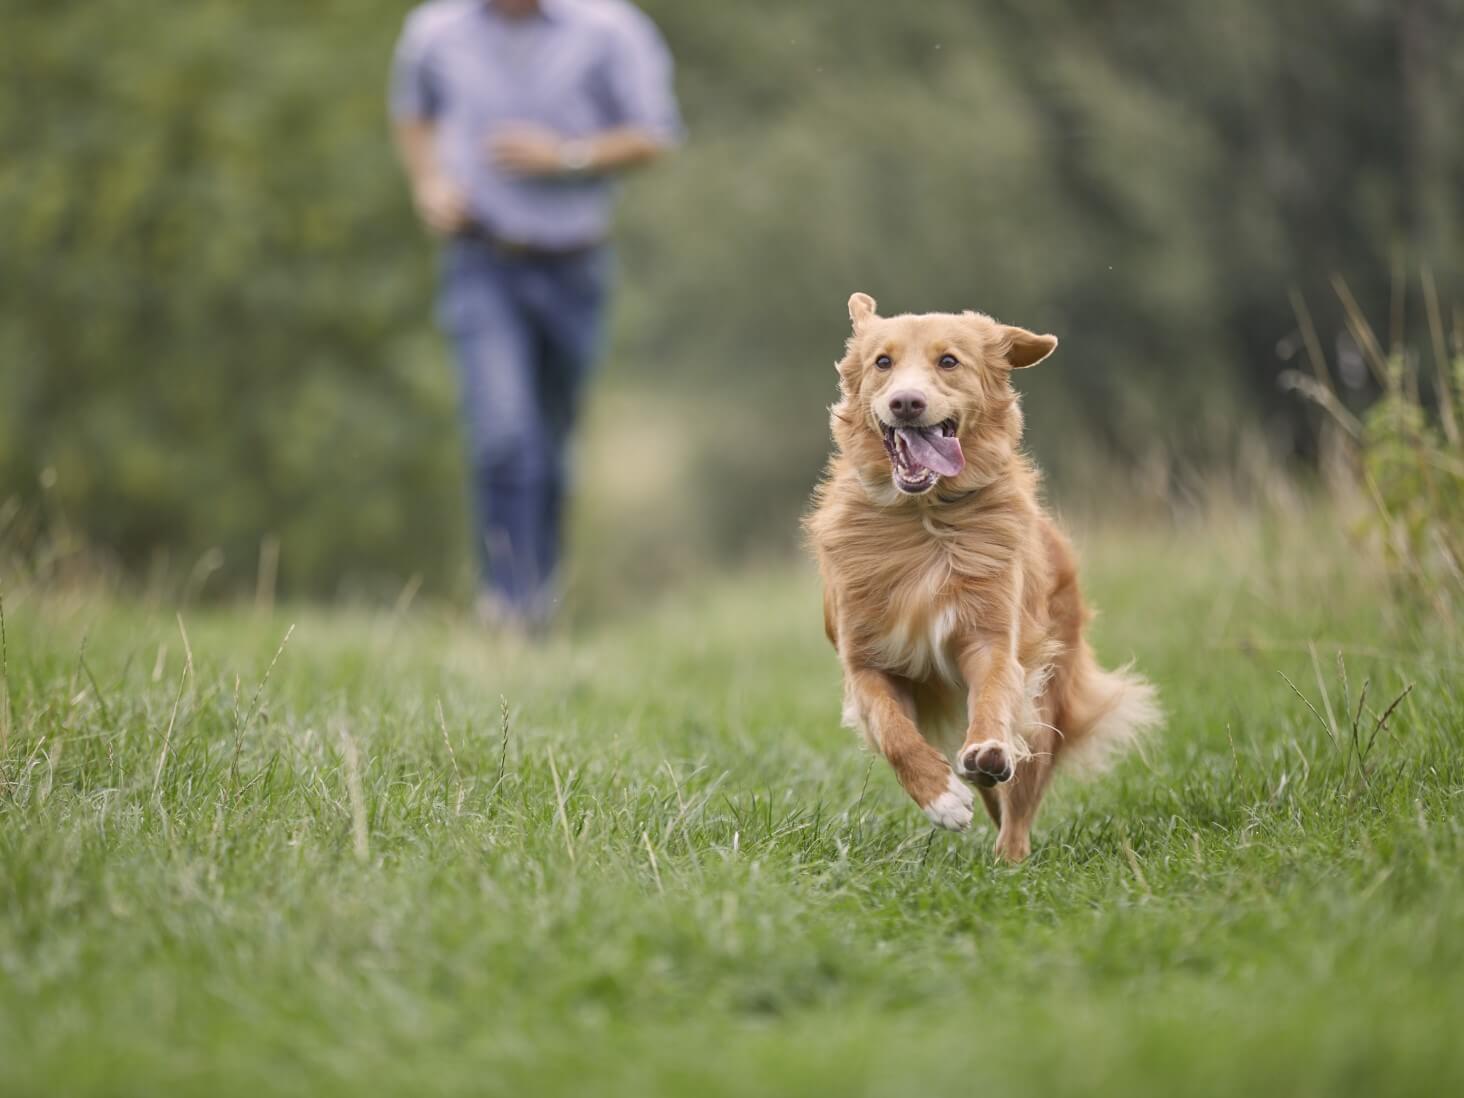 Duck Toller Retriever running in a field